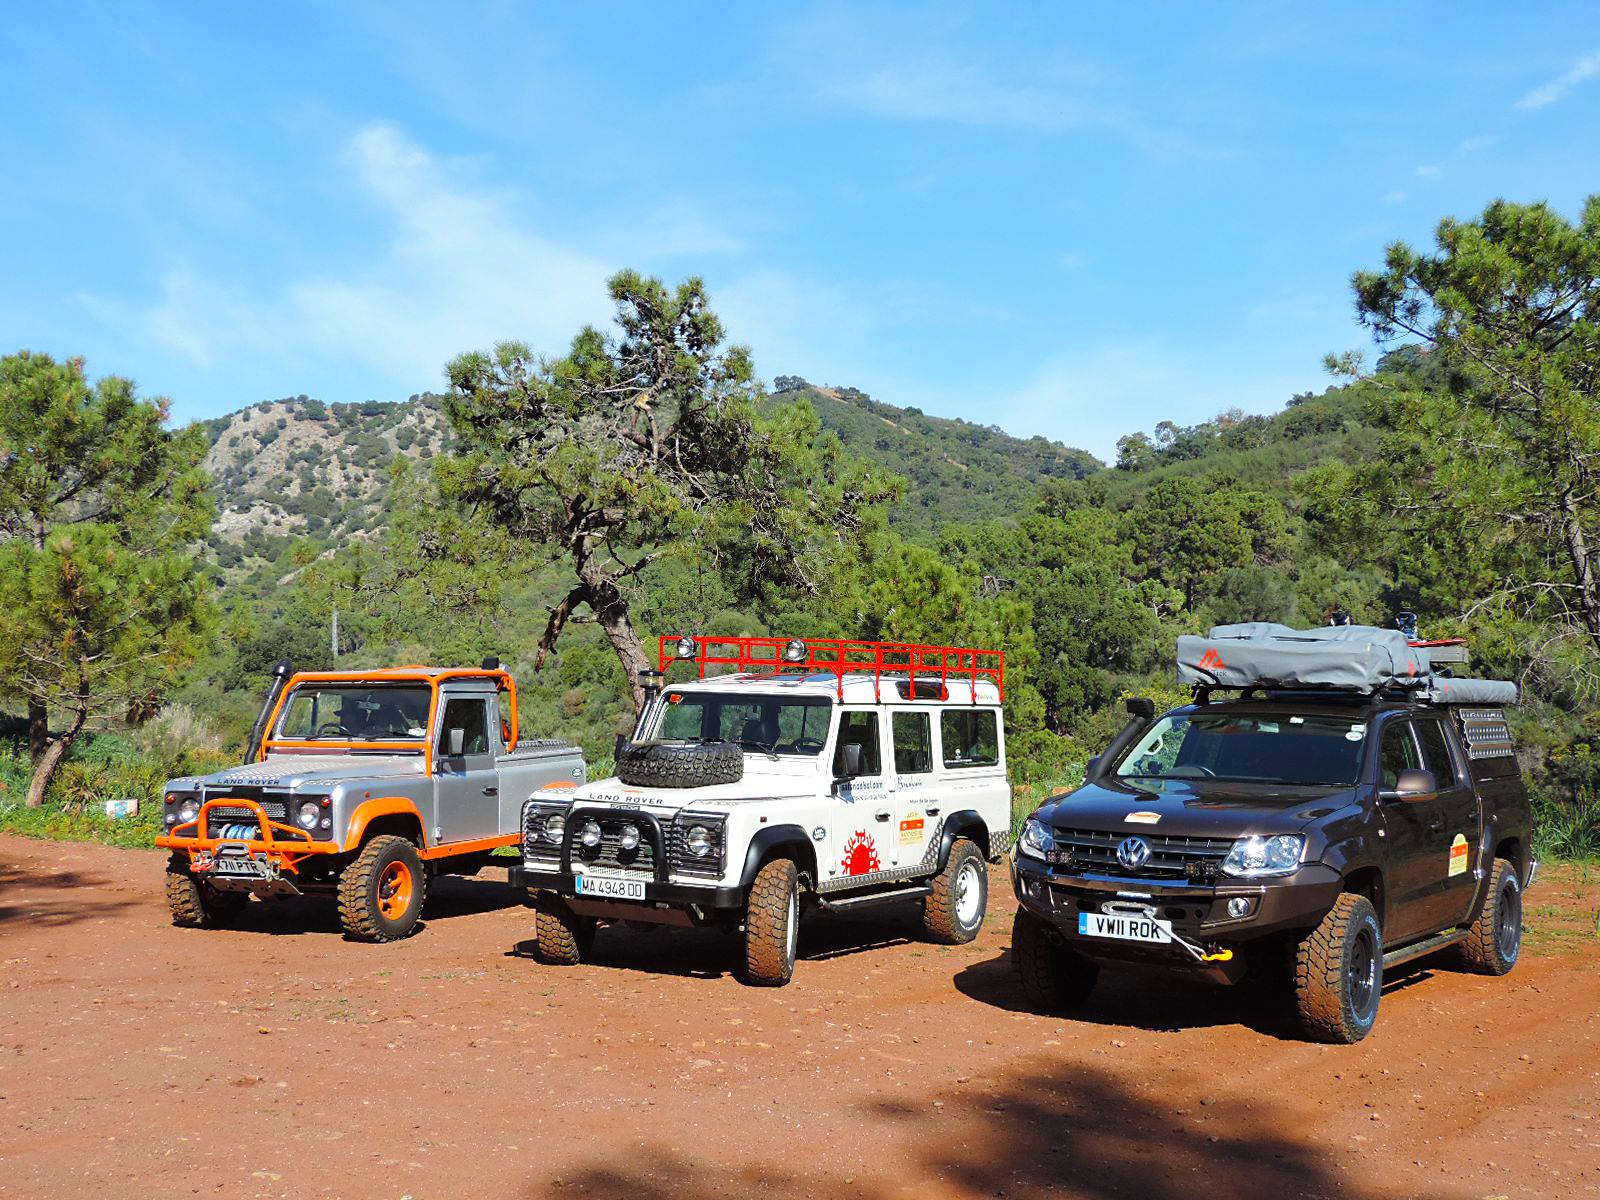 Marco safari 4x4 vehicles